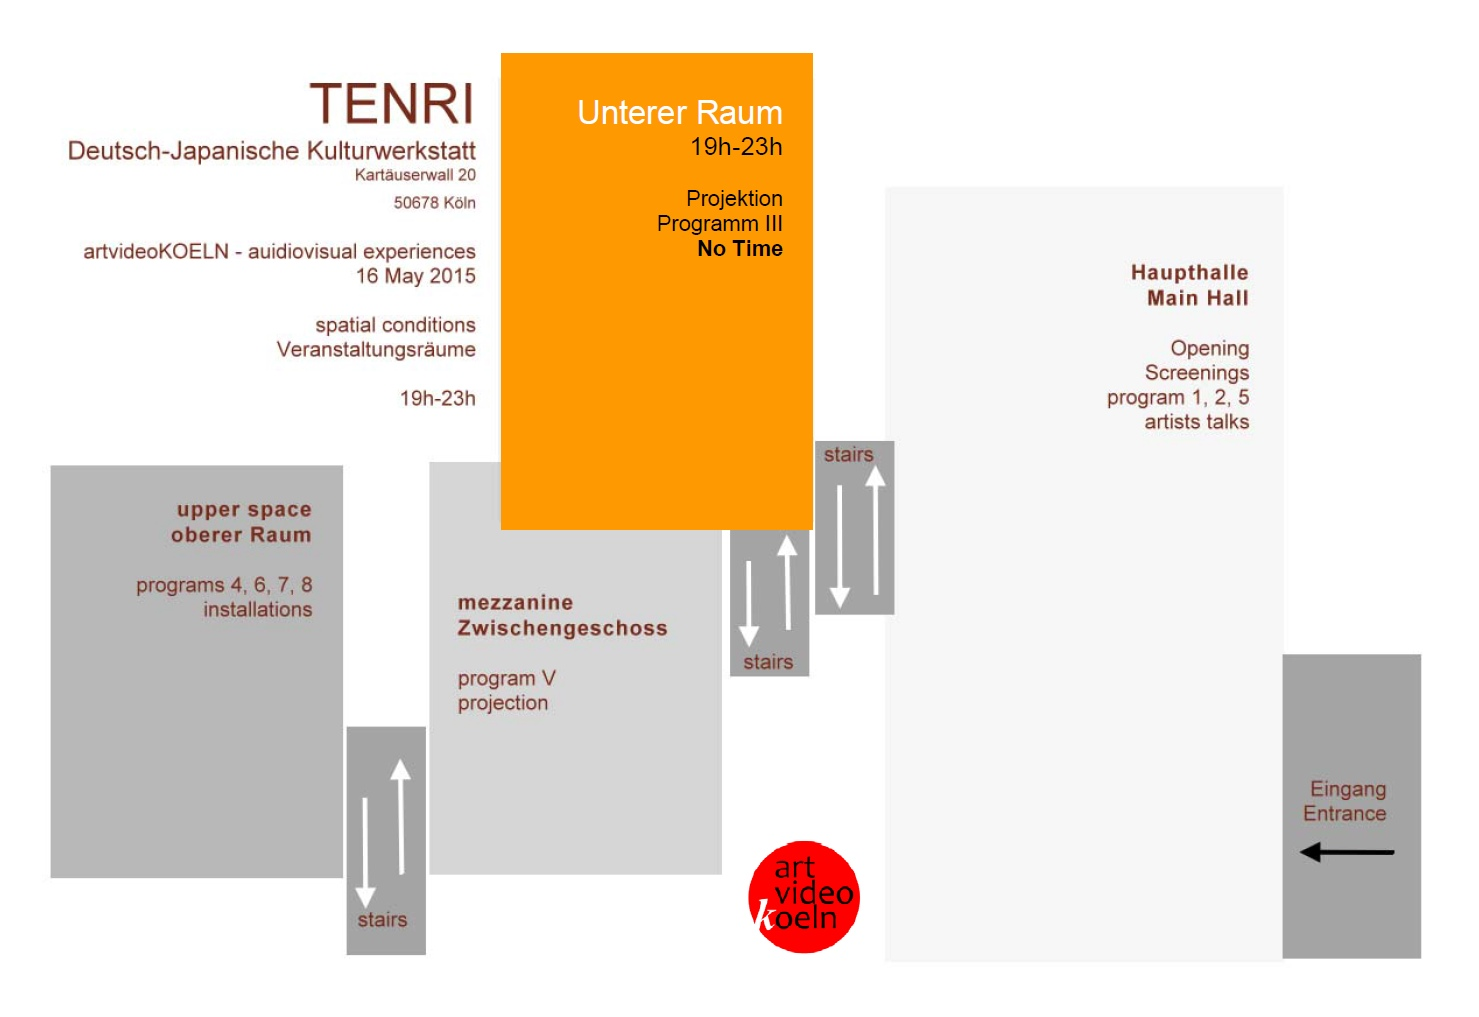 tenri-under-program33